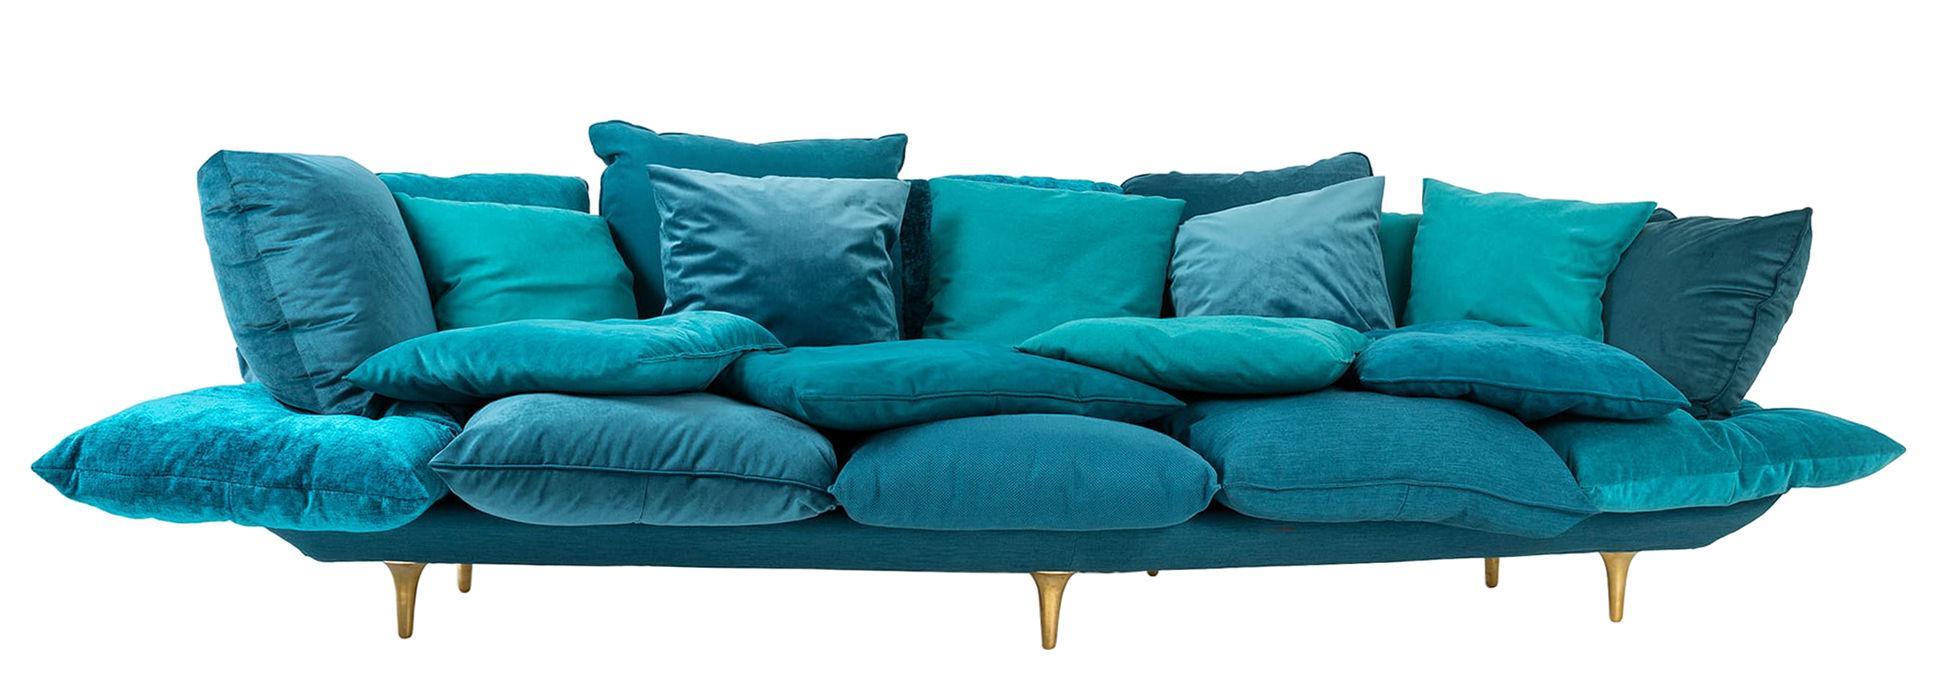 Canapé droit Comfy Seletti - Bleu | Made In Design